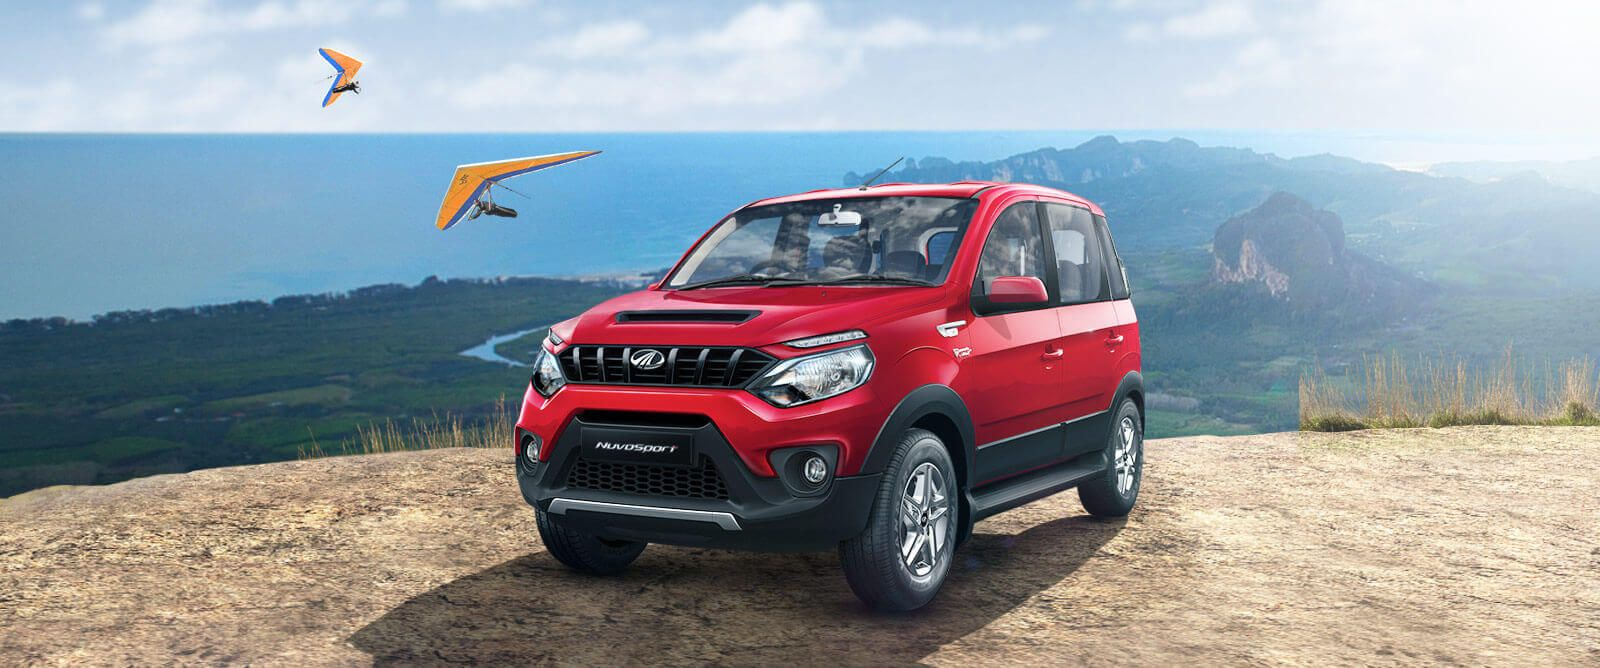 Sporty & Aggressive SUV Mahindra NuvoSport Wallpaper